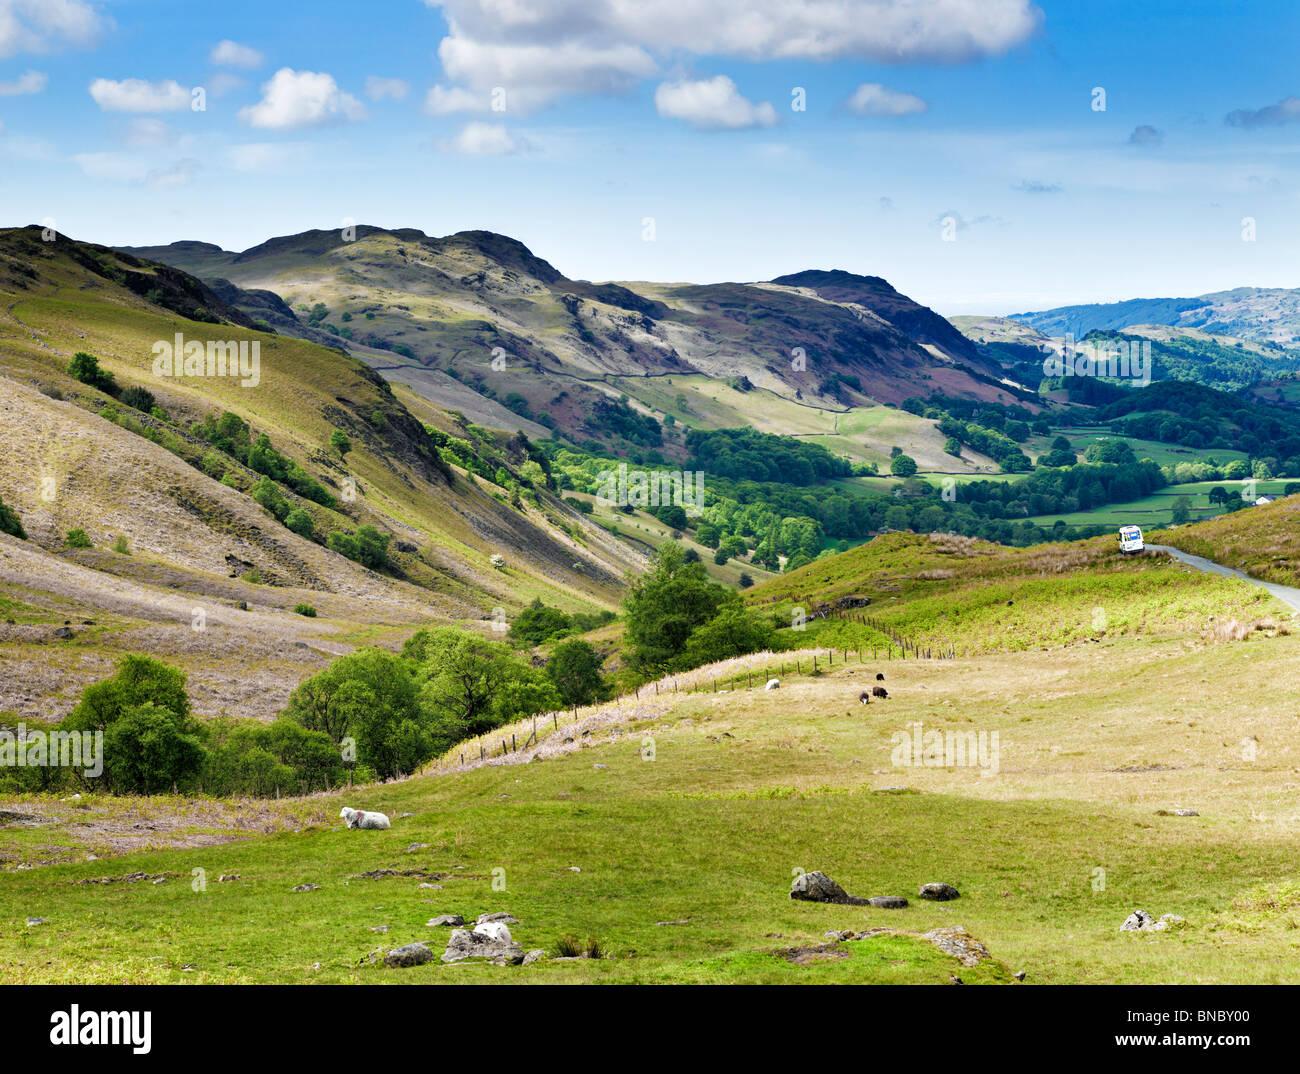 Eskdale Valley à la recherche de Hardknott Pass, le Lake District, Cumbria, Angleterre, Royaume-Uni Photo Stock